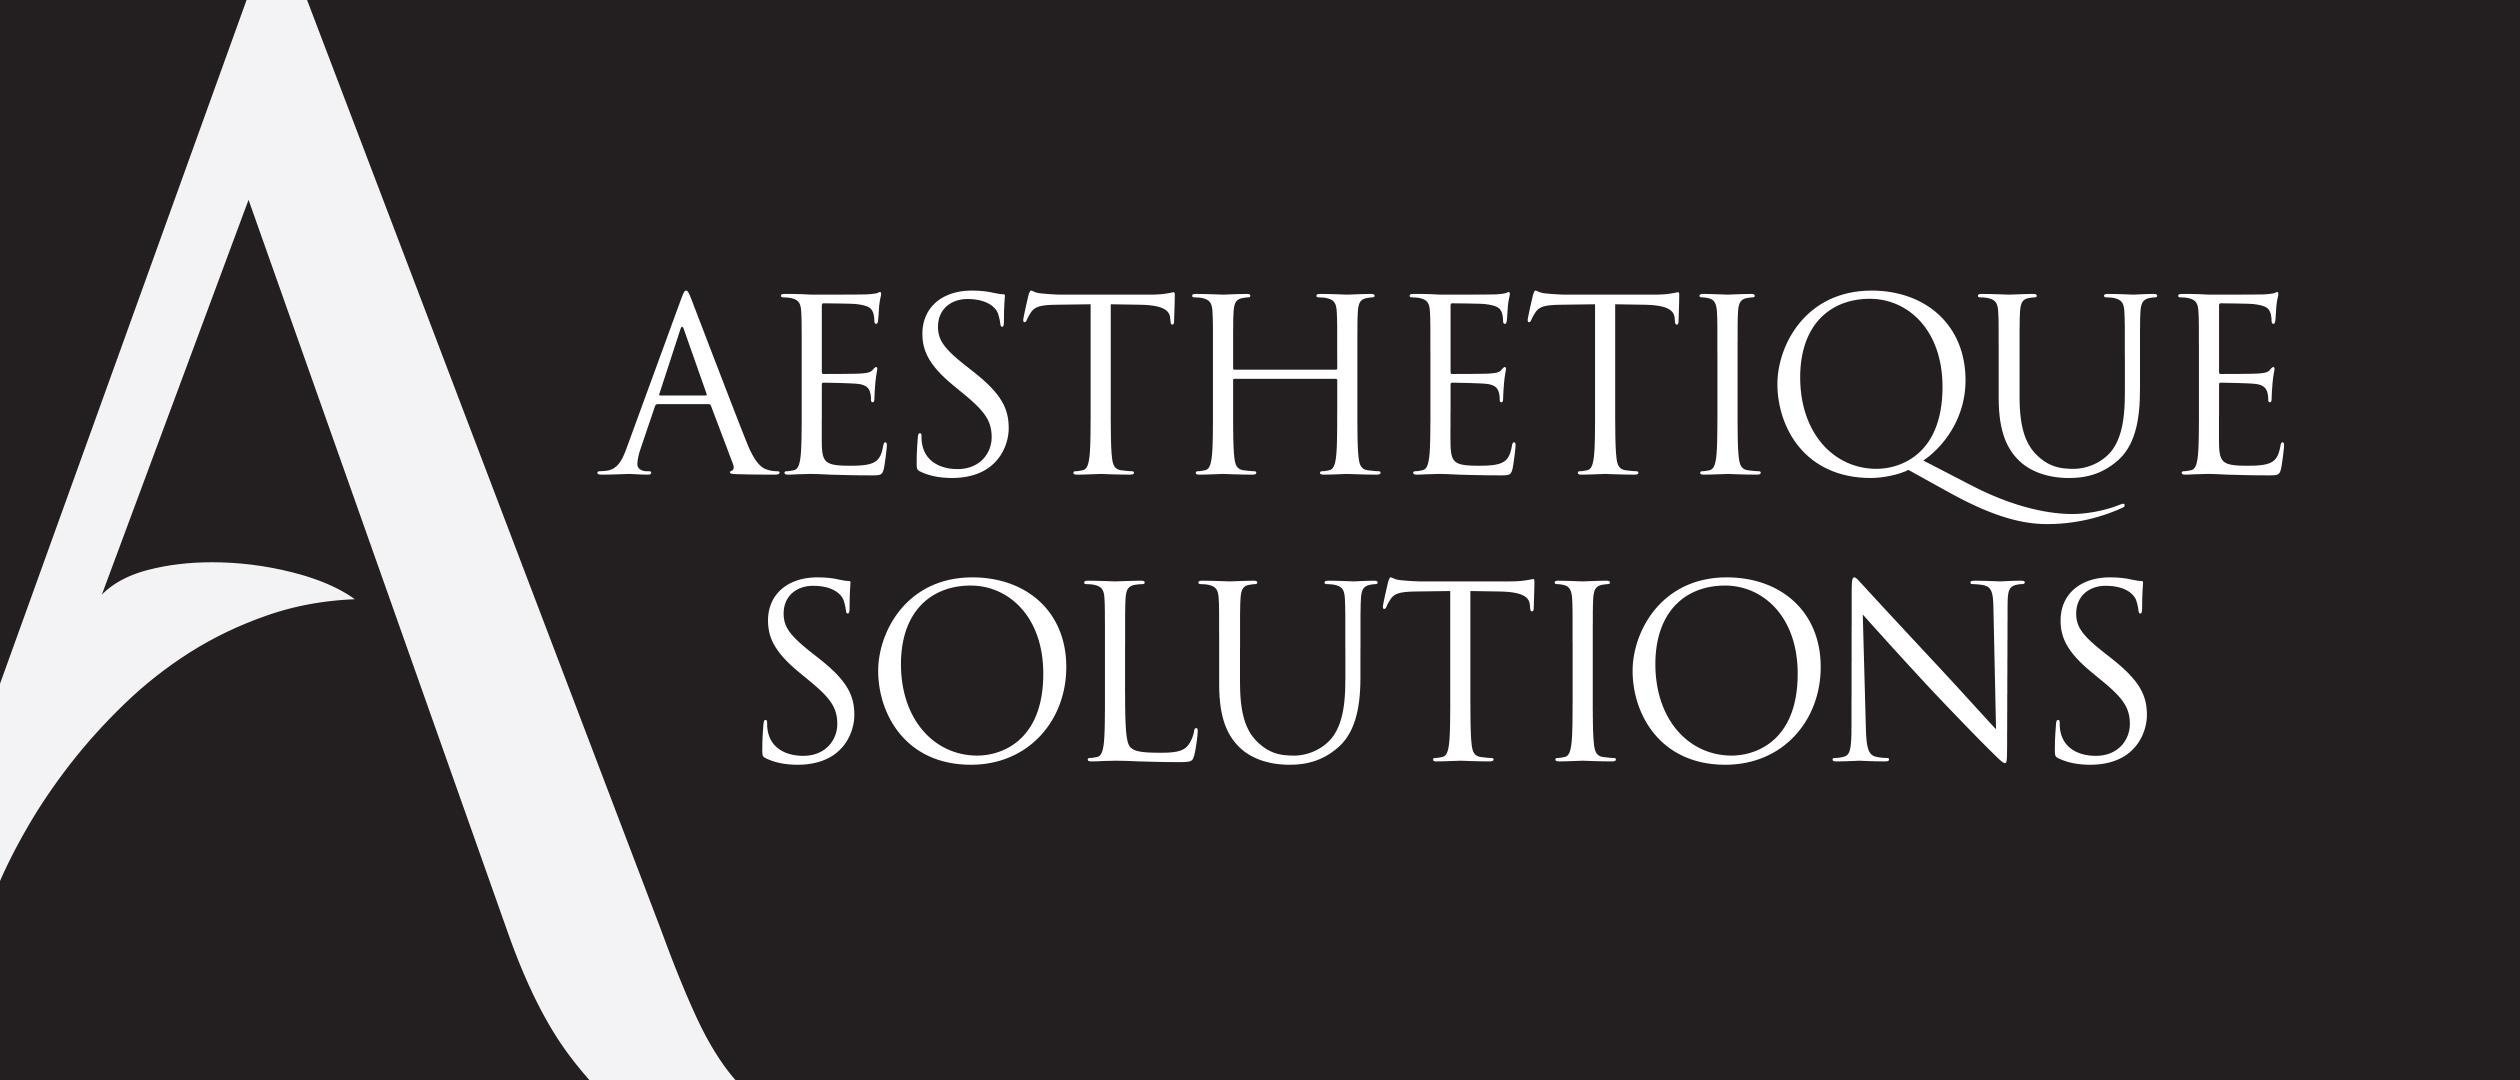 Aesthetique Solutions